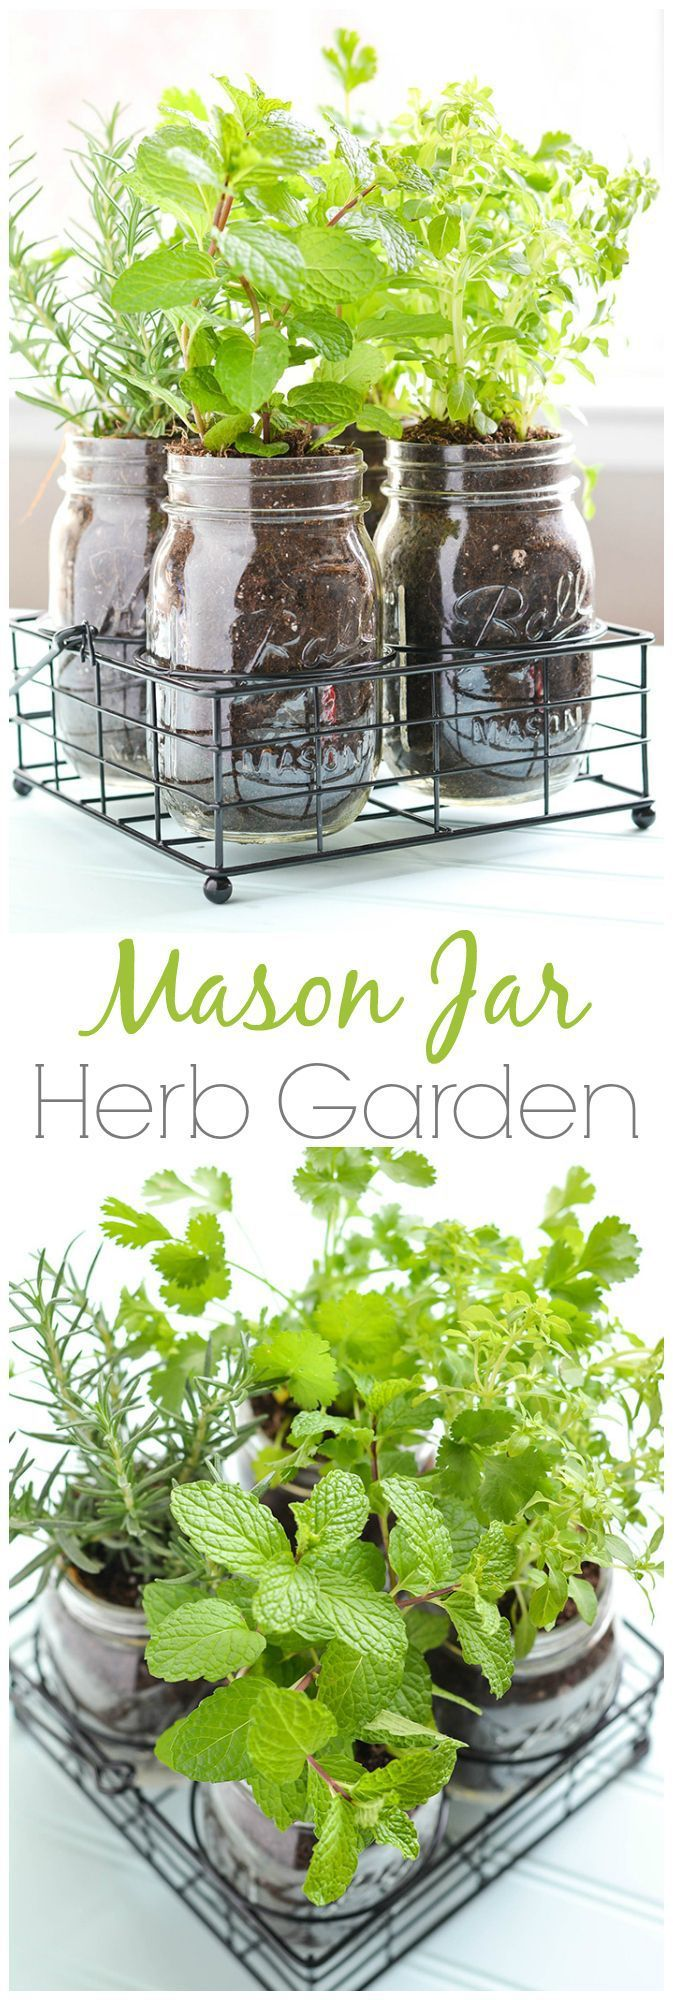 Mason Jar Diy Herb Garden Small Space Gardening 400 x 300